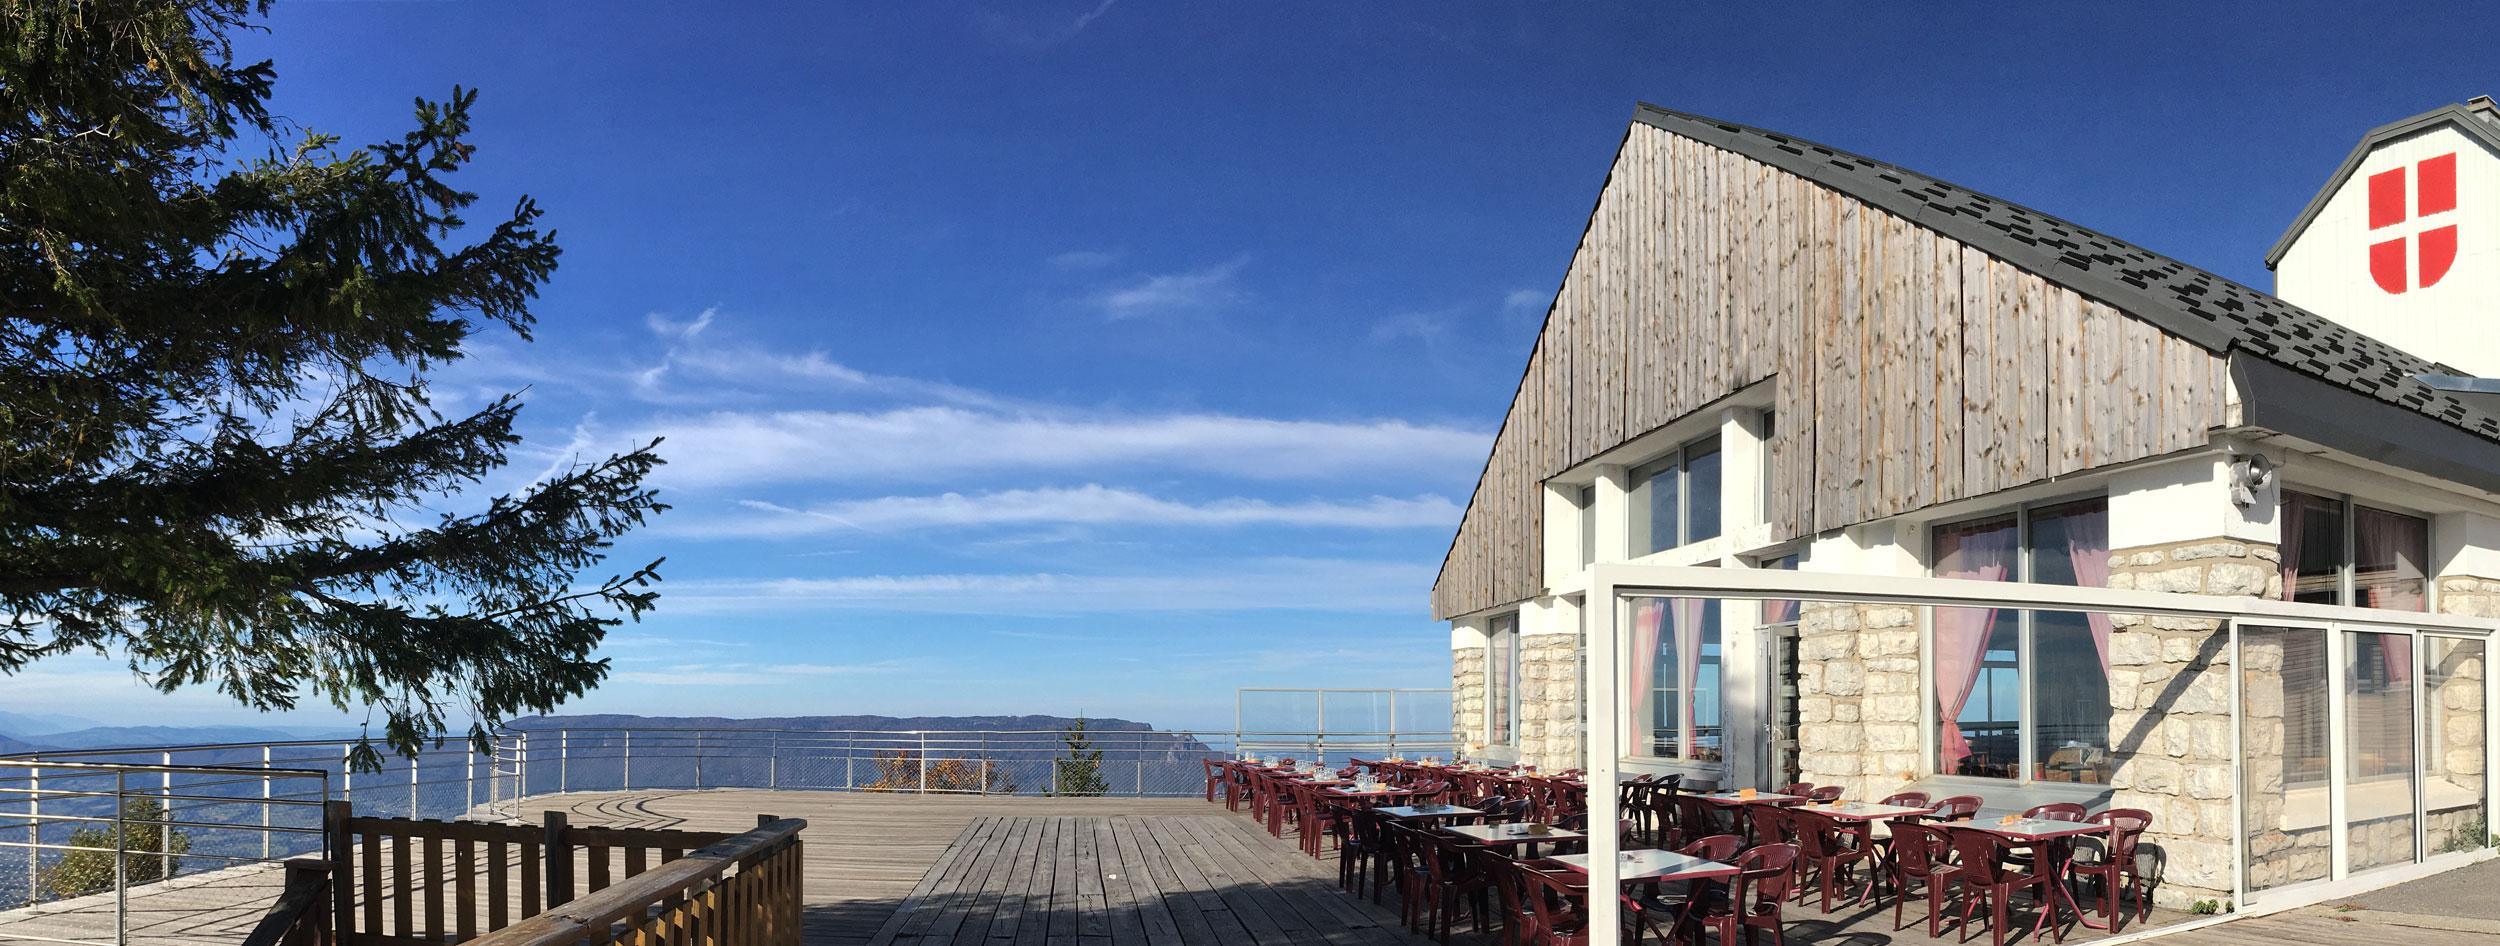 Restaurant panoramique - Le Revard Savoie